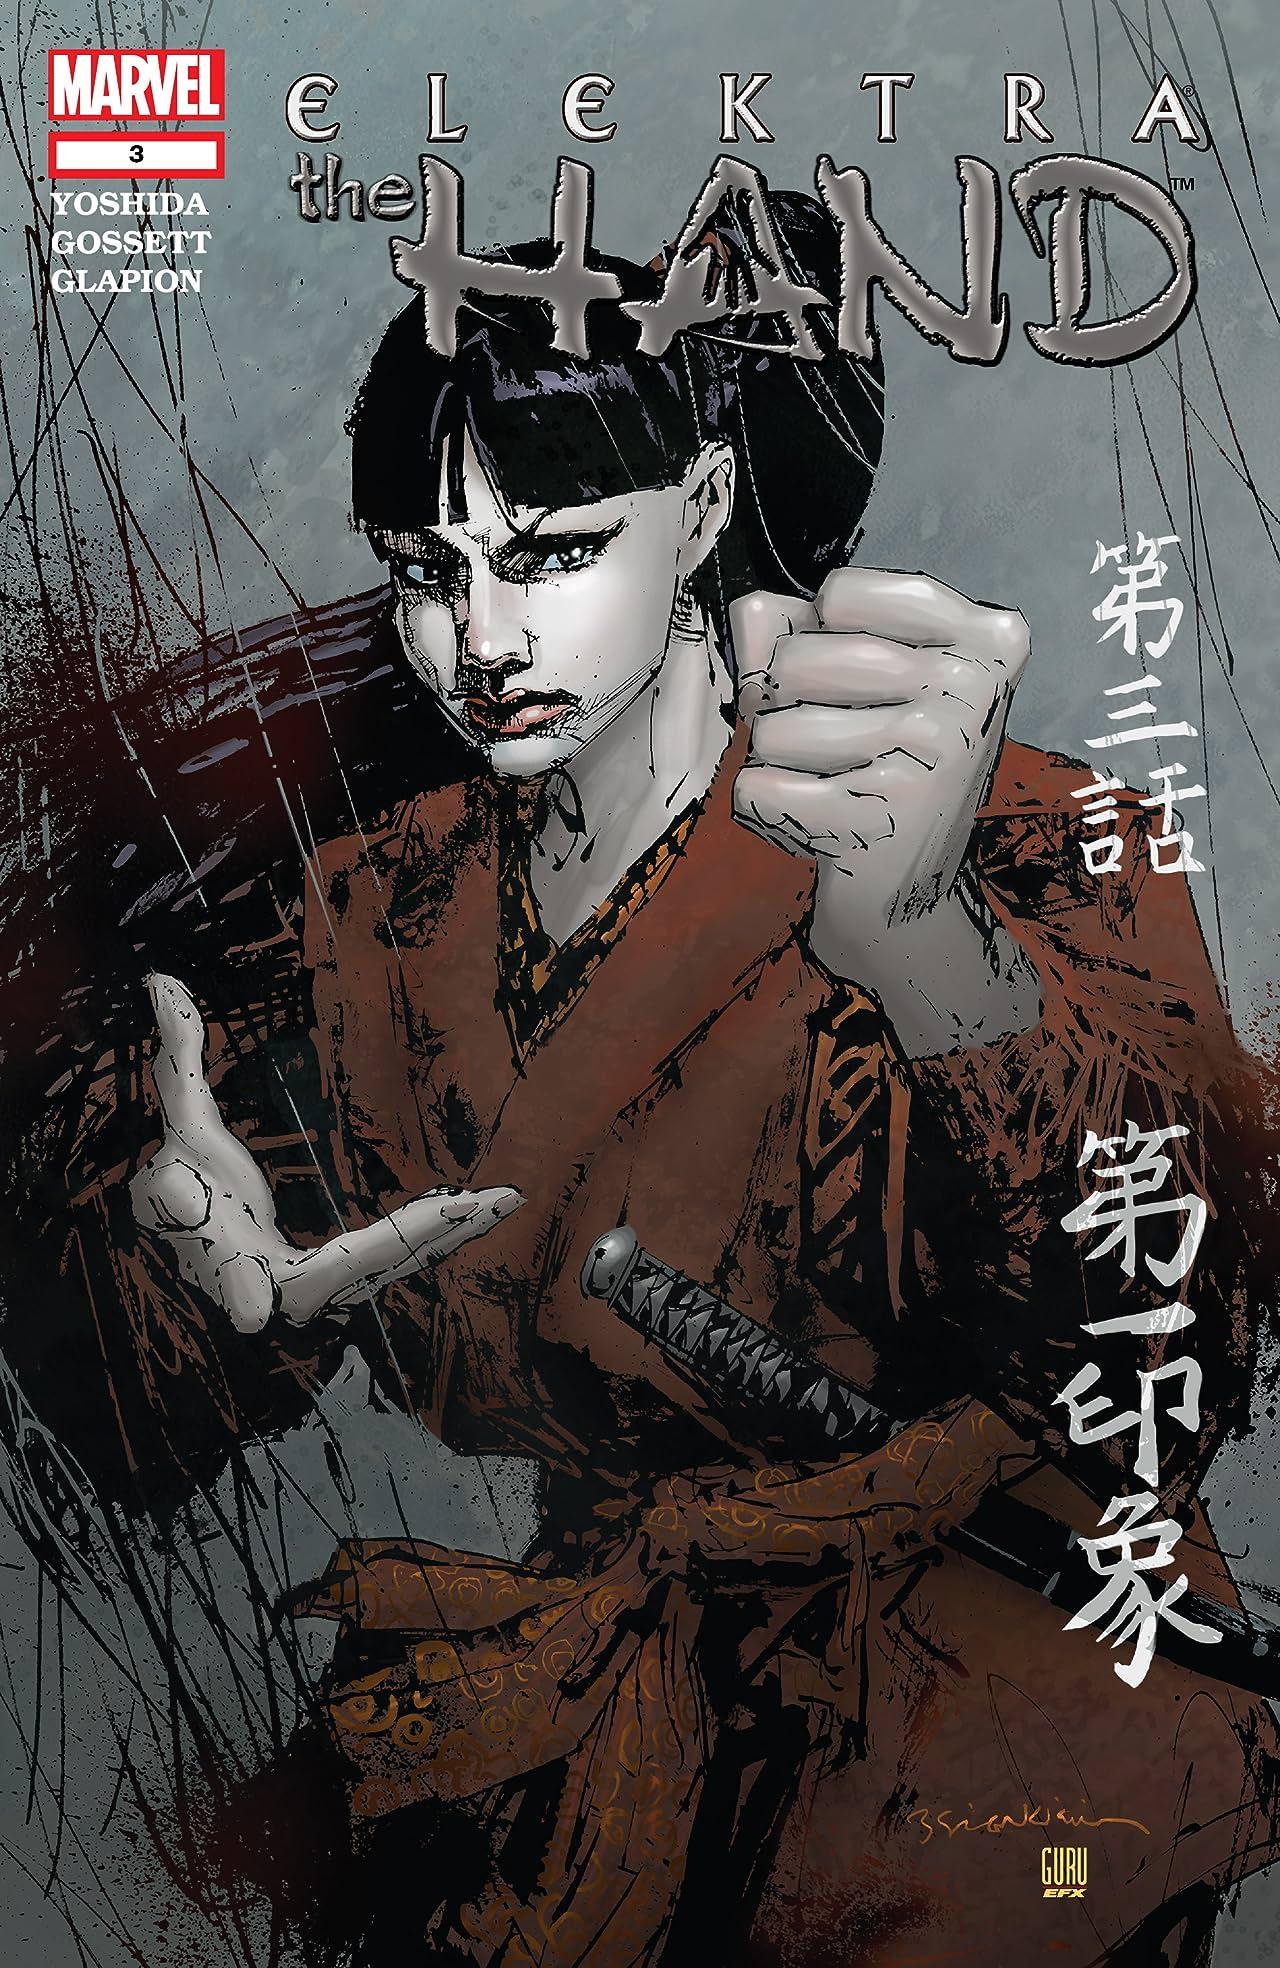 Elektra: The Hand (2004) #3 (of 5)